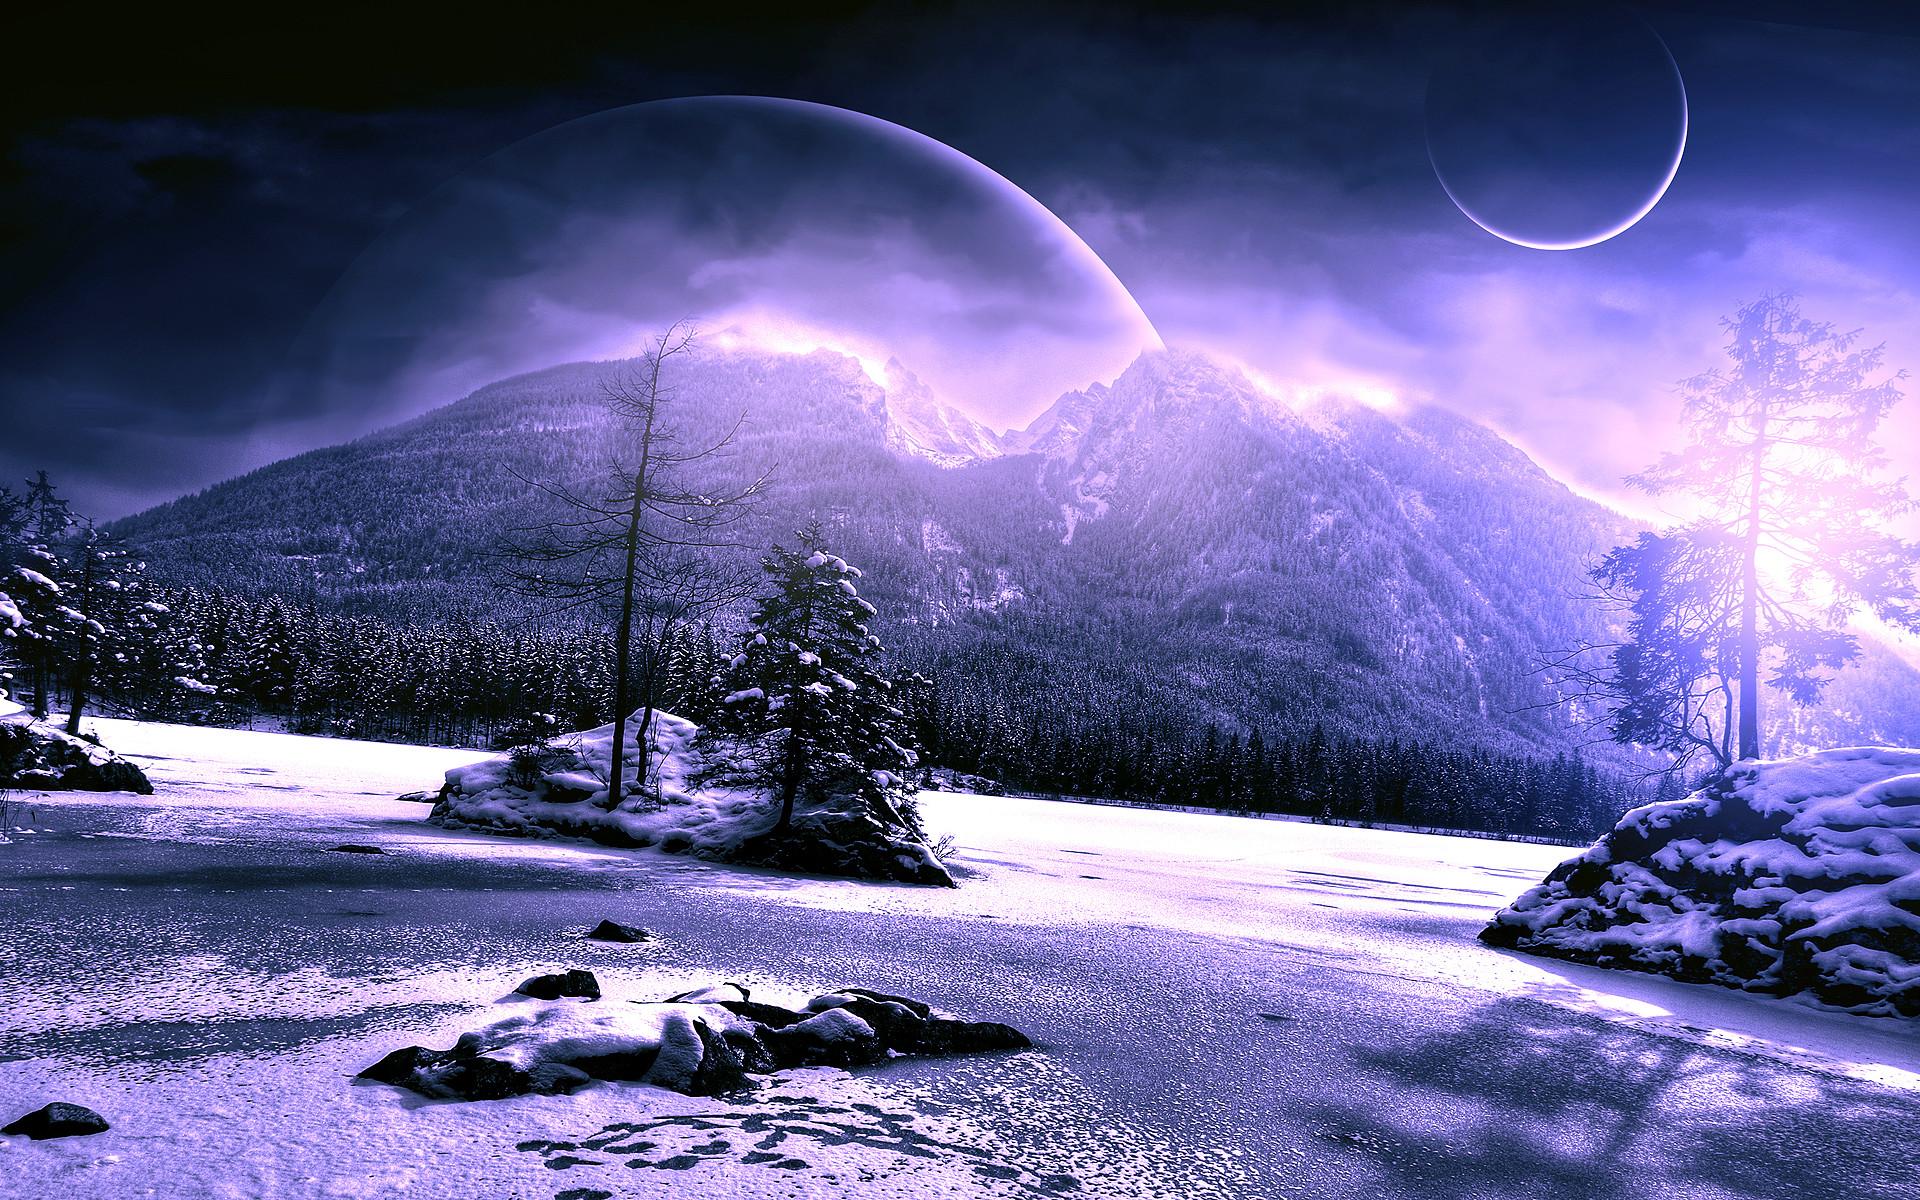 Snow Winter Trees Mountains Alien Landscape Planets Purple HD wallpaper  thumb